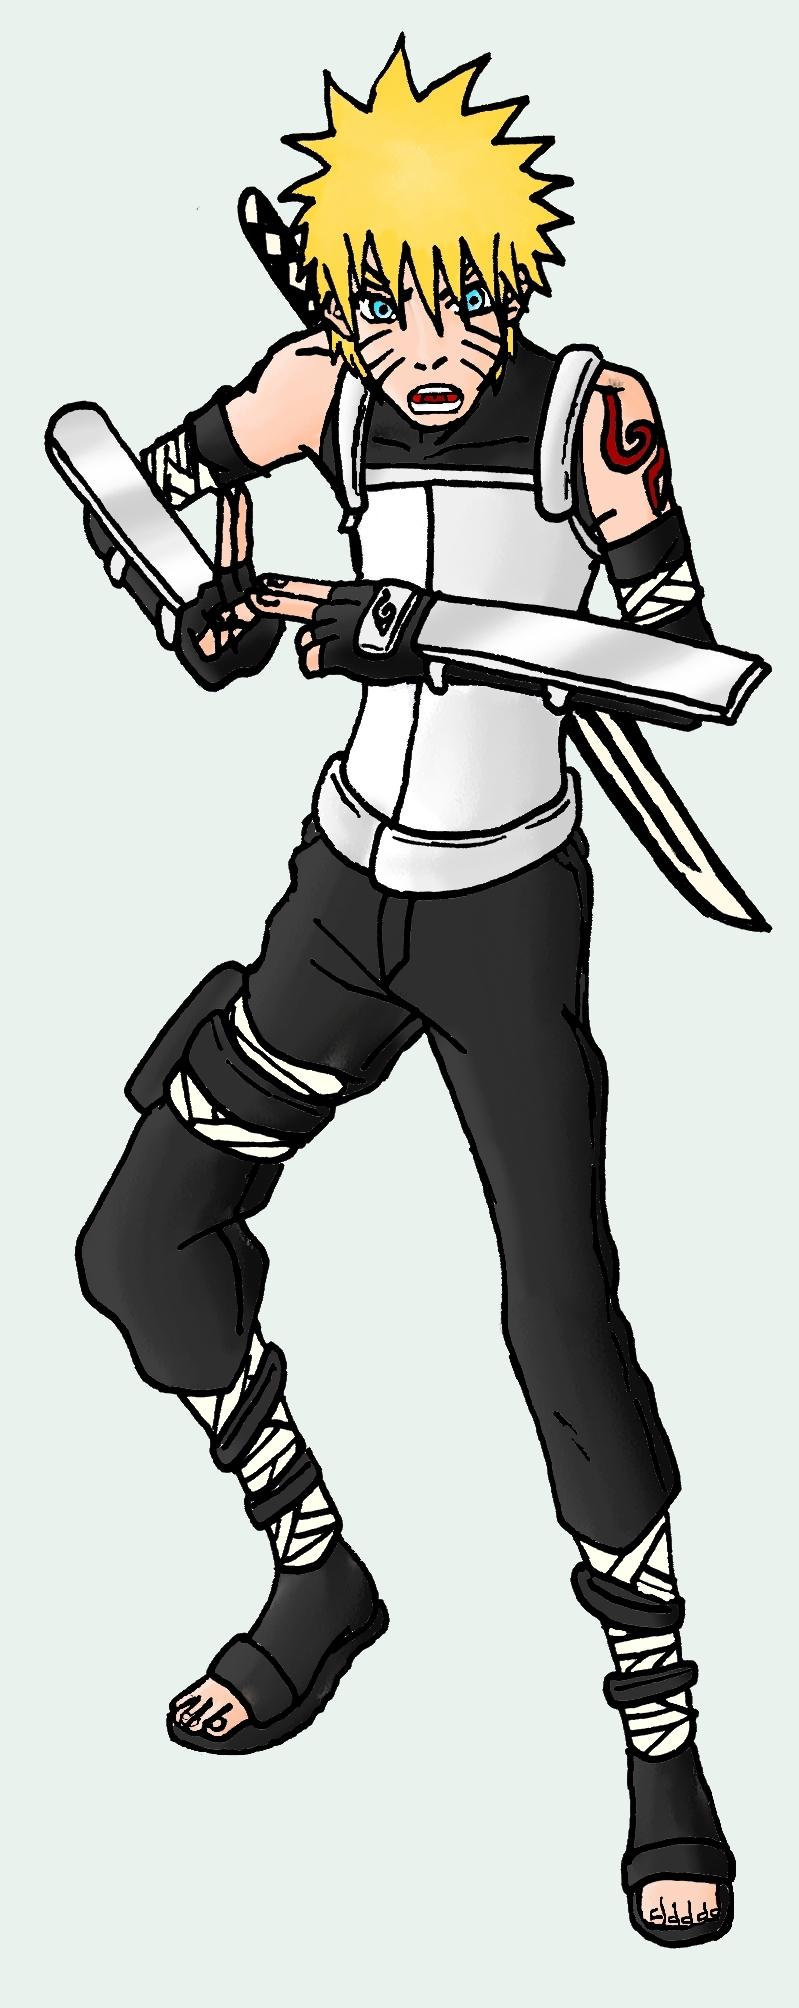 Naruto As A Anbu Anbu Naruto Fanfiction...